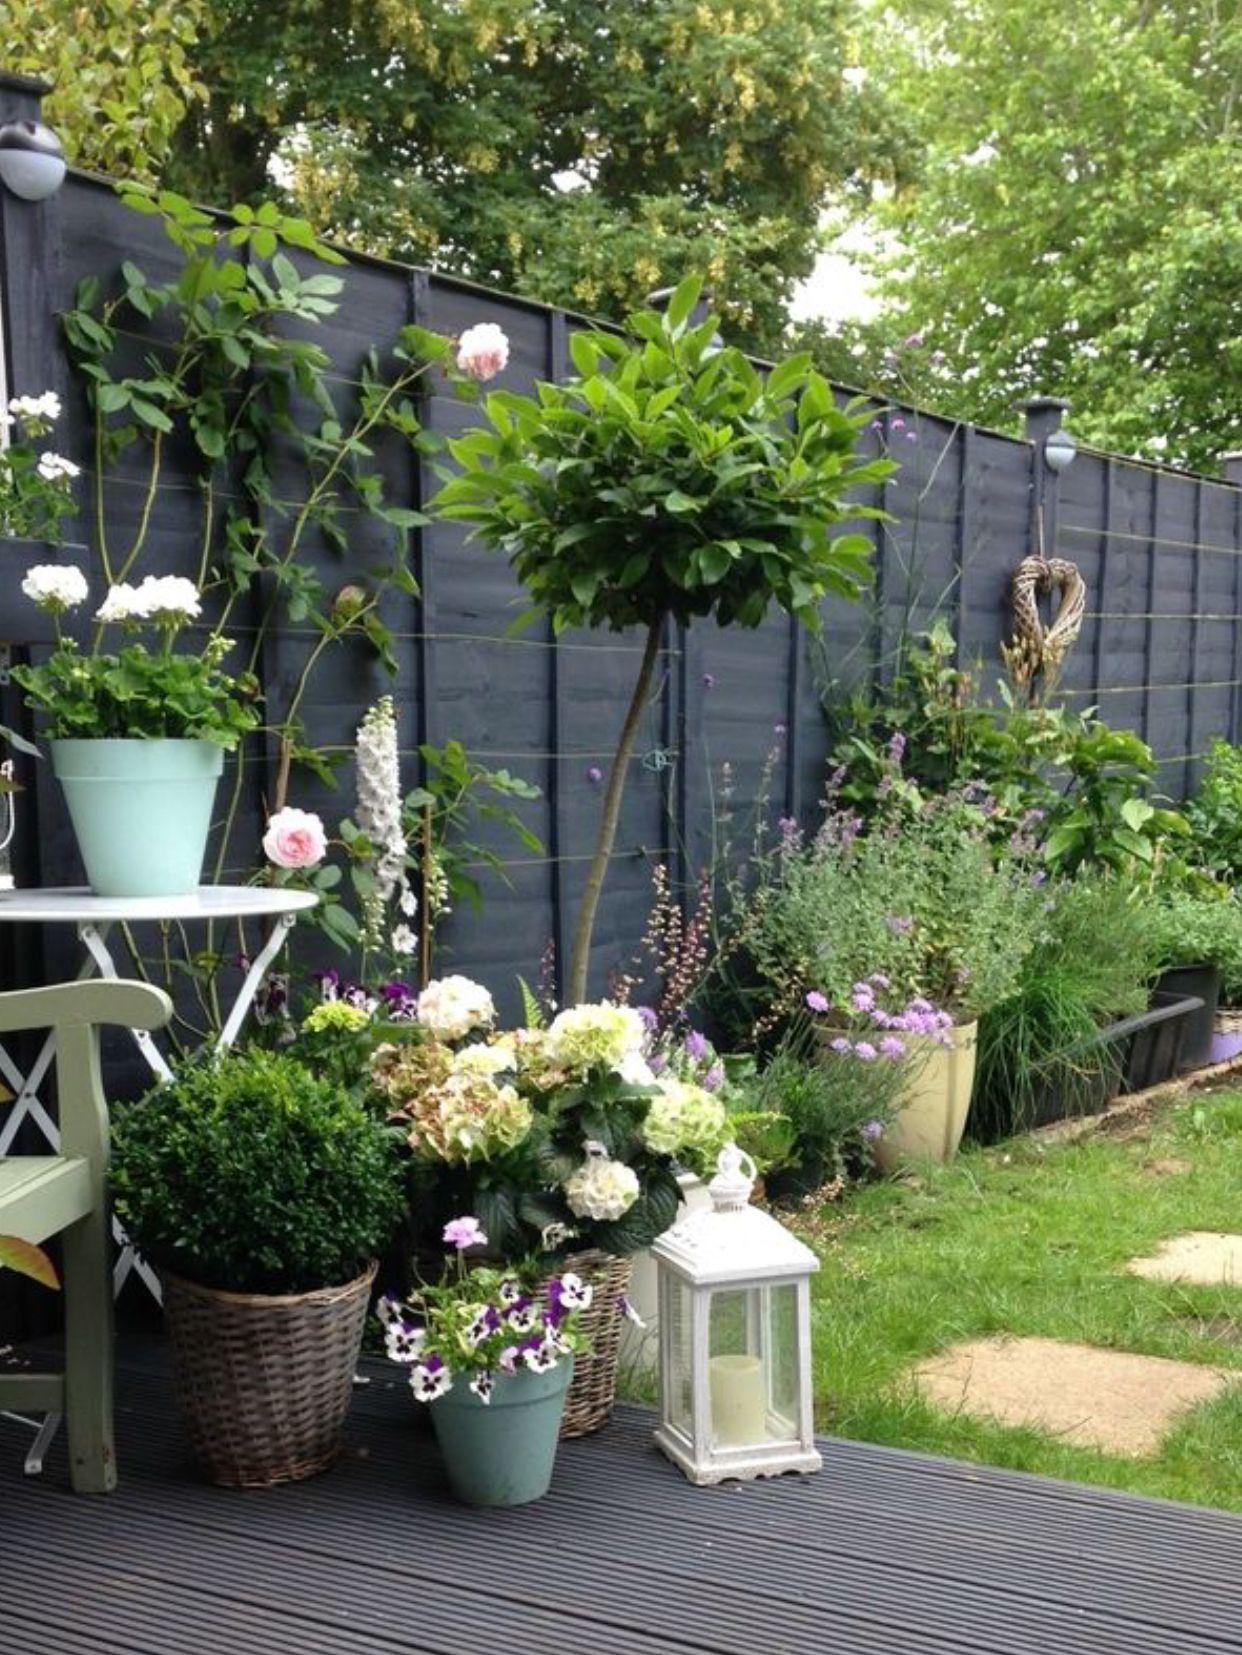 Pingl par cecile sur jardin terrasse jardins - Amenagement terrasse et jardin photo ...